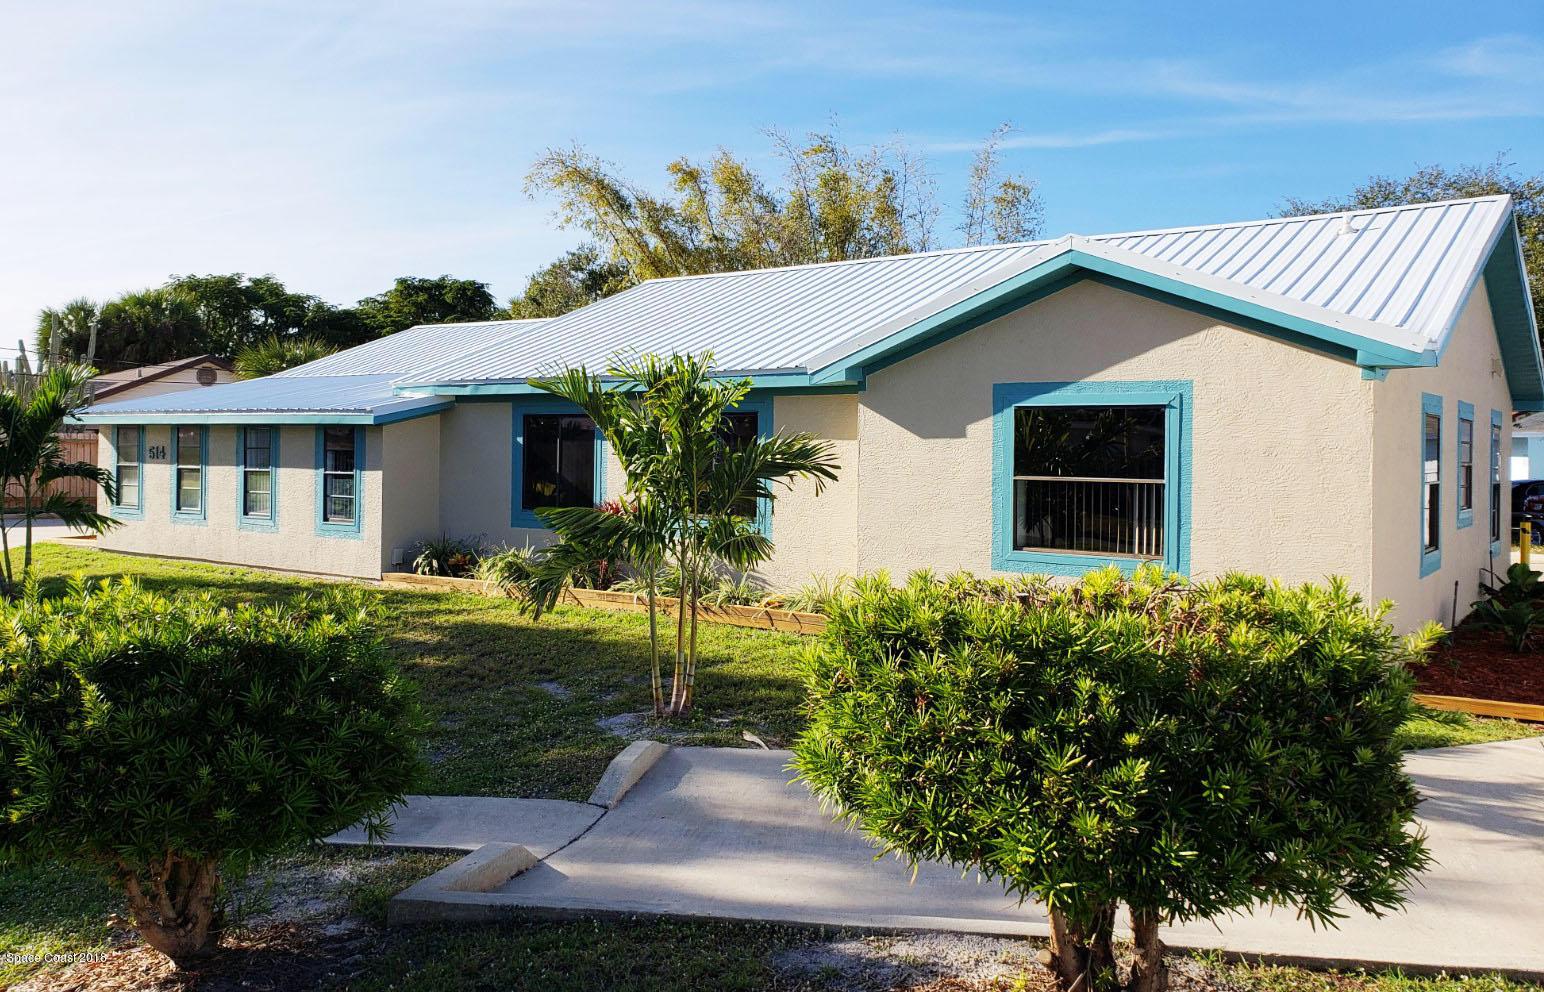 Commercial for Rent at 514 Loveridge 514 Loveridge Melbourne, Florida 32935 United States